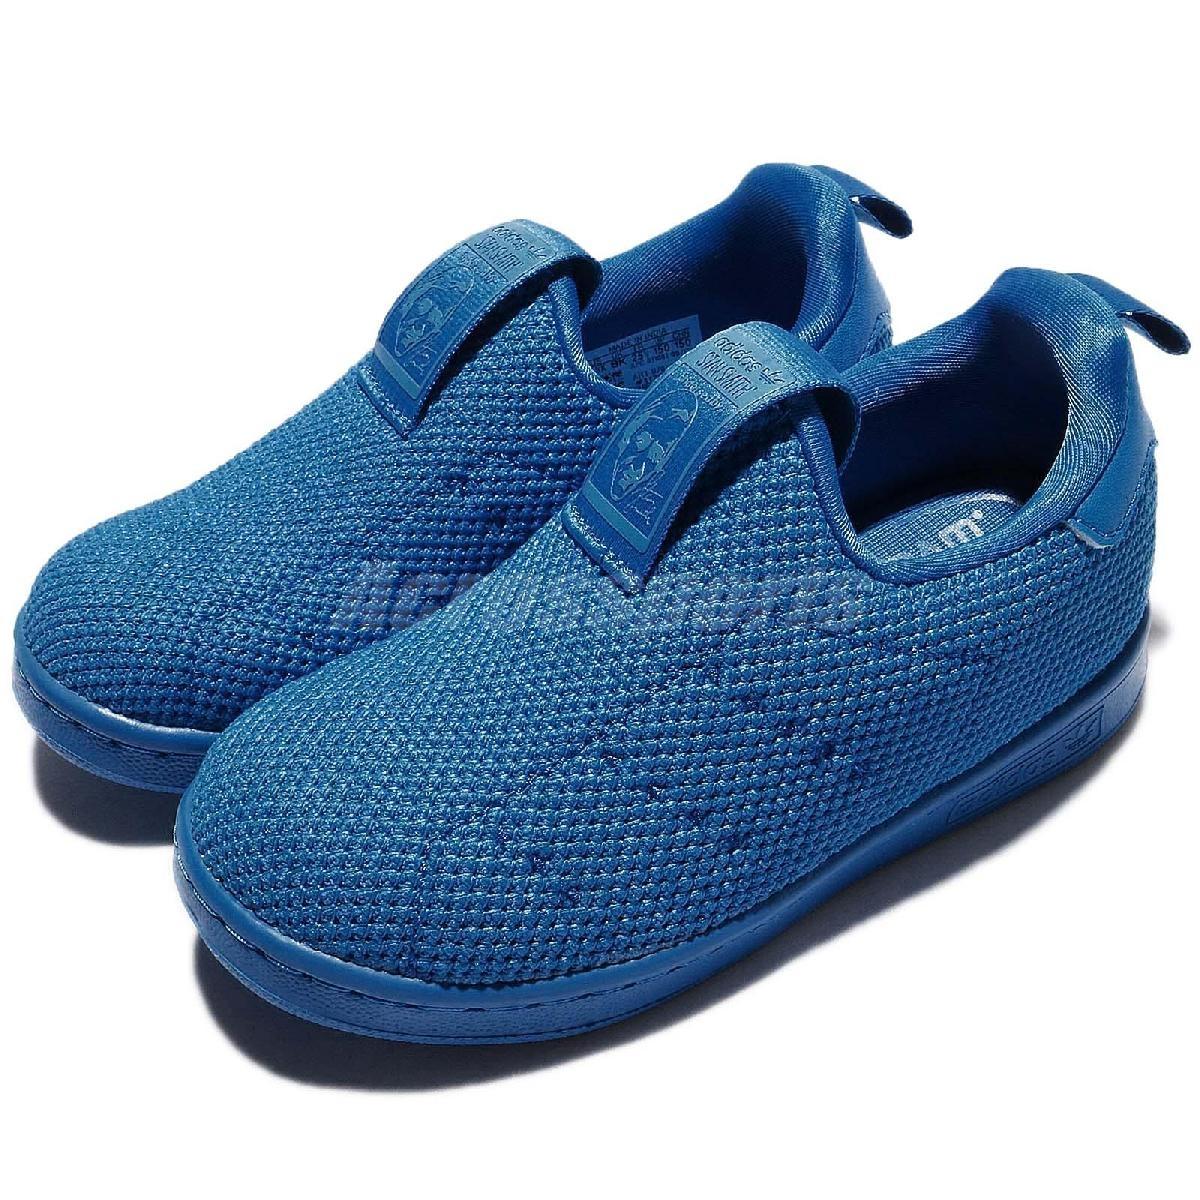 adidas 休閒鞋 Stan Smith 360 SC I 藍 基本款 襪套式 無鞋帶 童鞋 小童鞋【PUMP306】 BZ0551